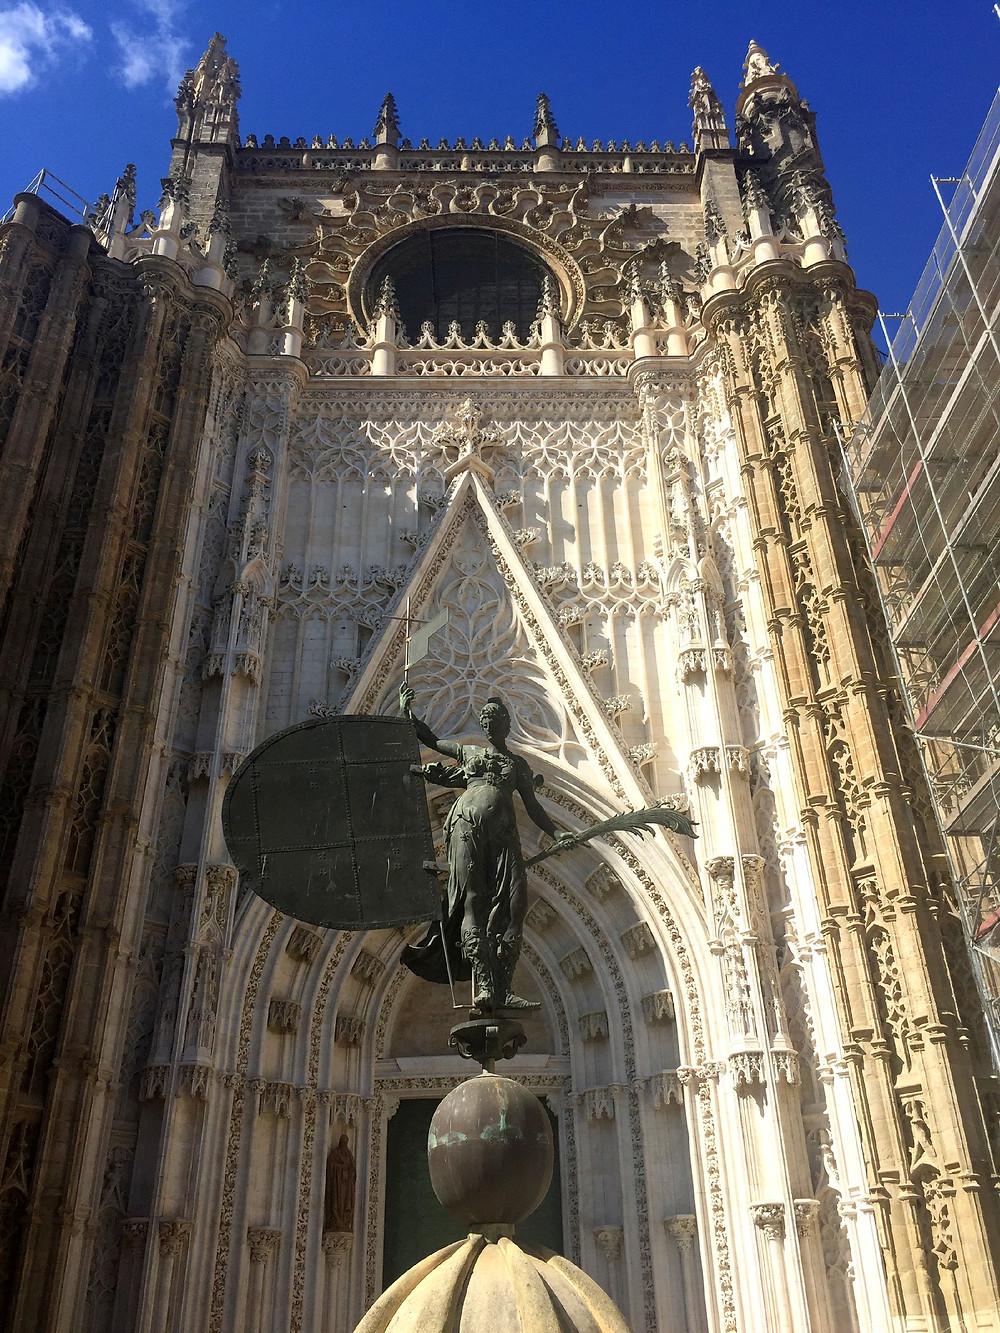 Puerta de San Cristobal - Catedral de Sevilha - Espanha